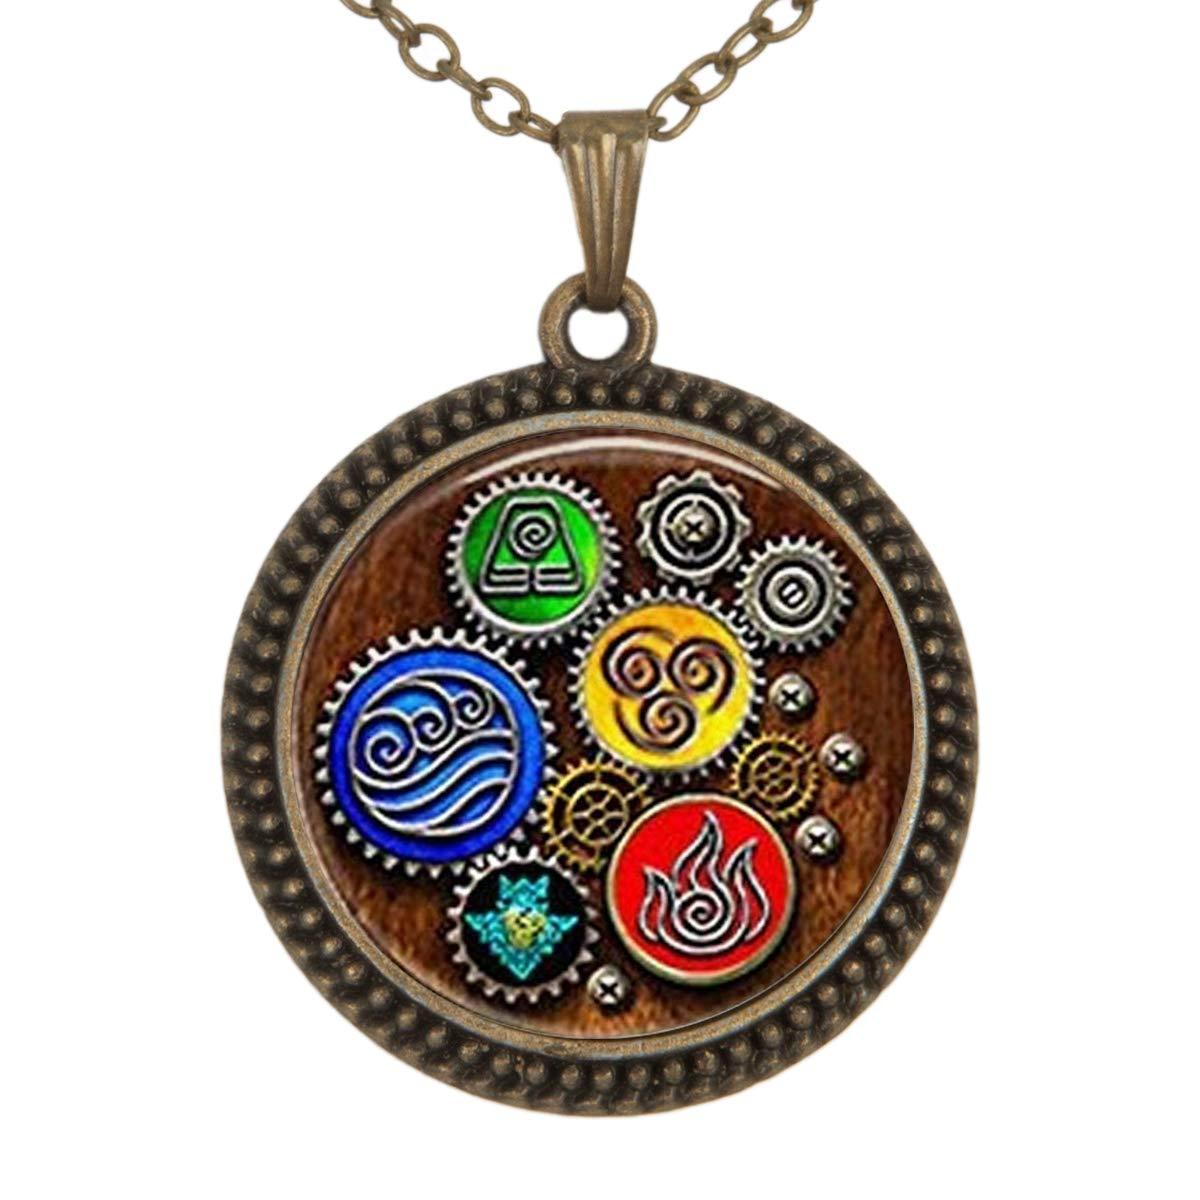 Family Decor Zeitschaltung Pendant Necklace Cabochon Glass Vintage Bronze Chain Necklace Jewelry Handmade